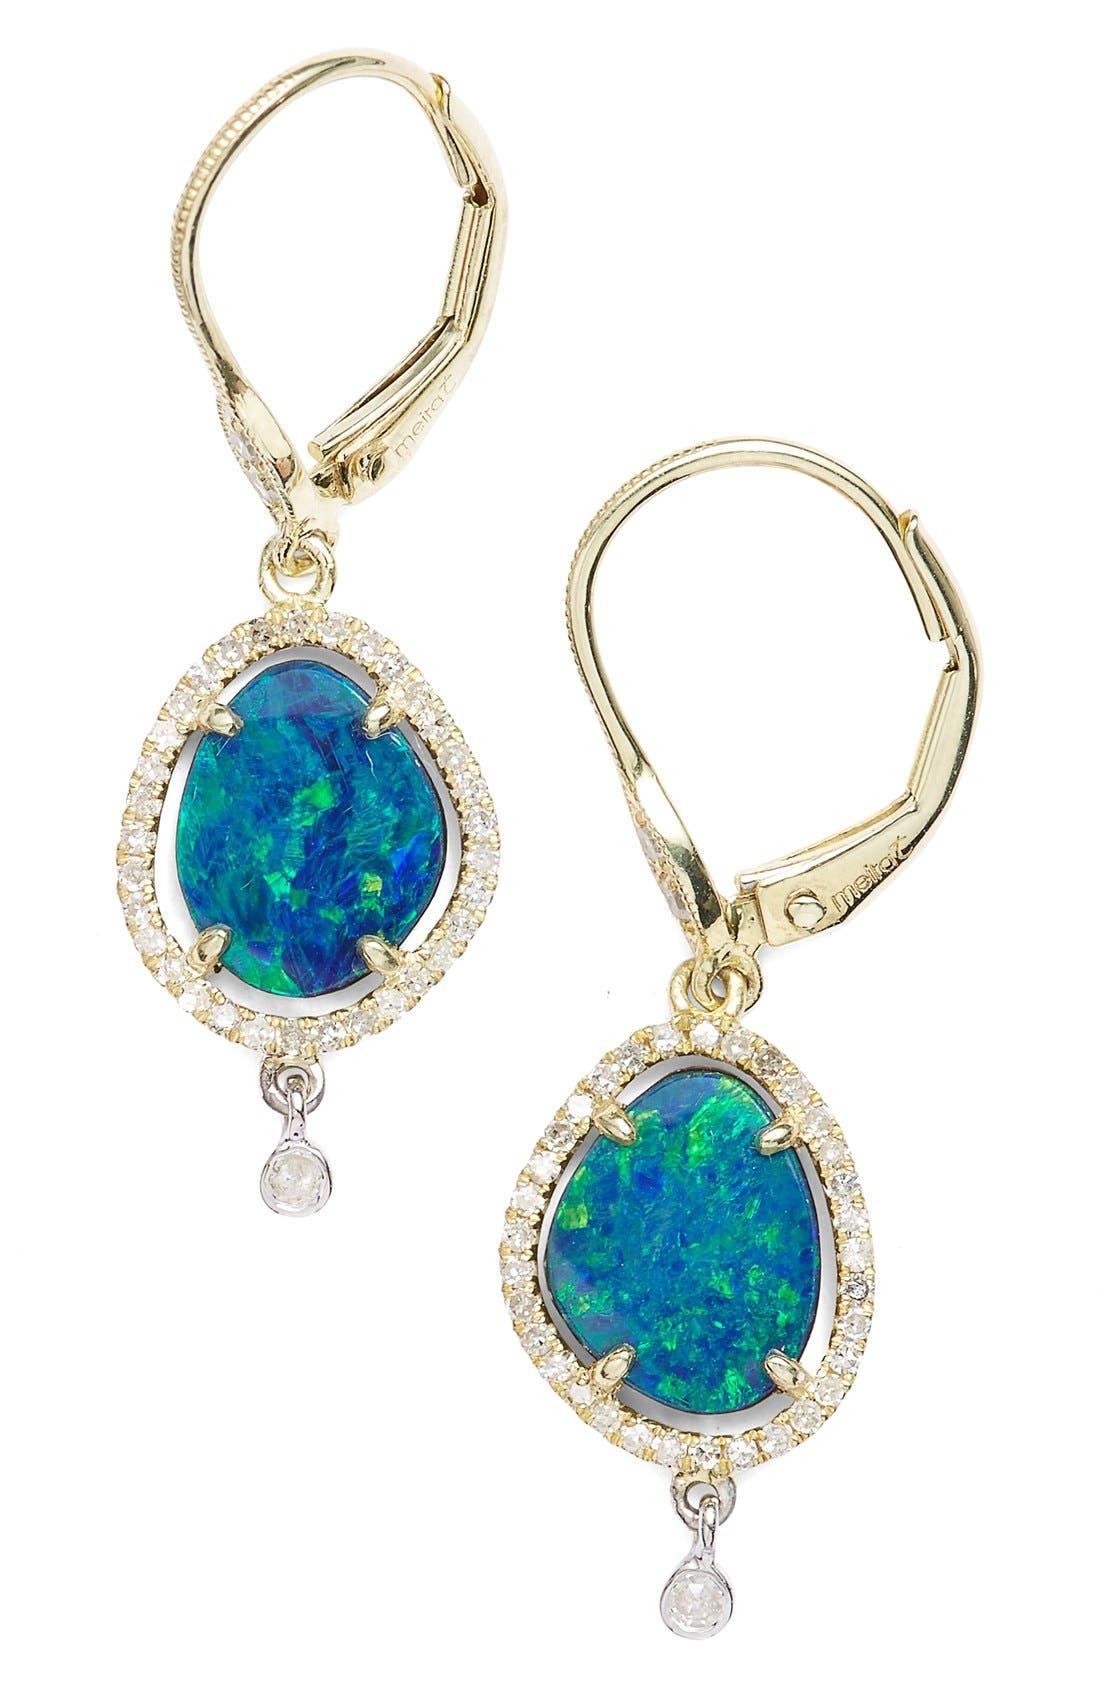 Alternate Image 1 Selected - Meira T Diamond & Semiprecious Stone Drop Earrings